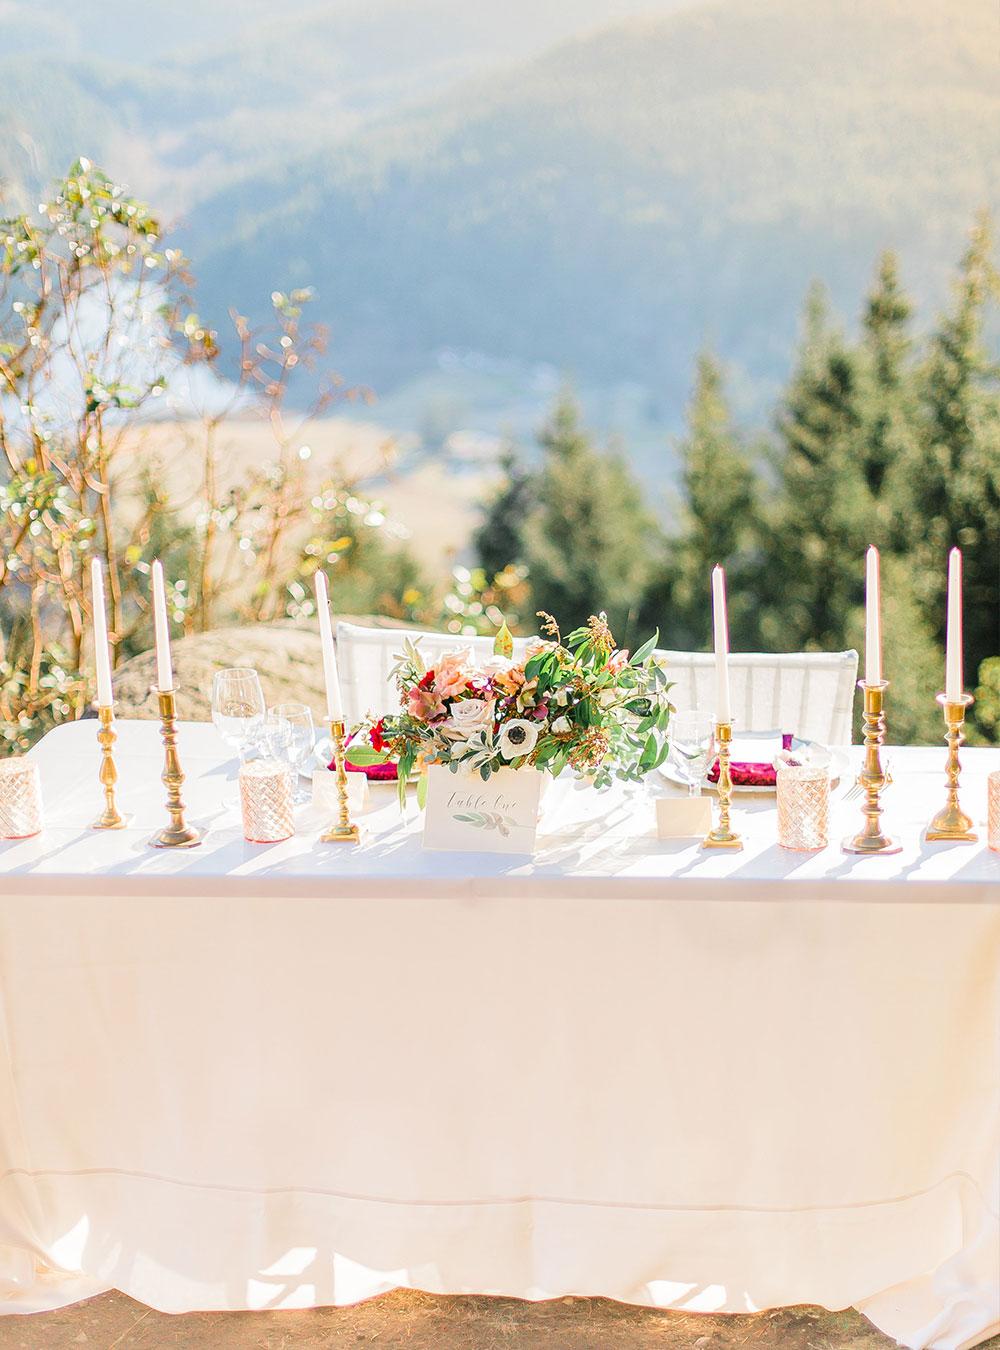 White Linen, White Dupioni, White Tablecloth, Outdoor Linen, Outdoor Tablecloth, Outdoor Table Setting